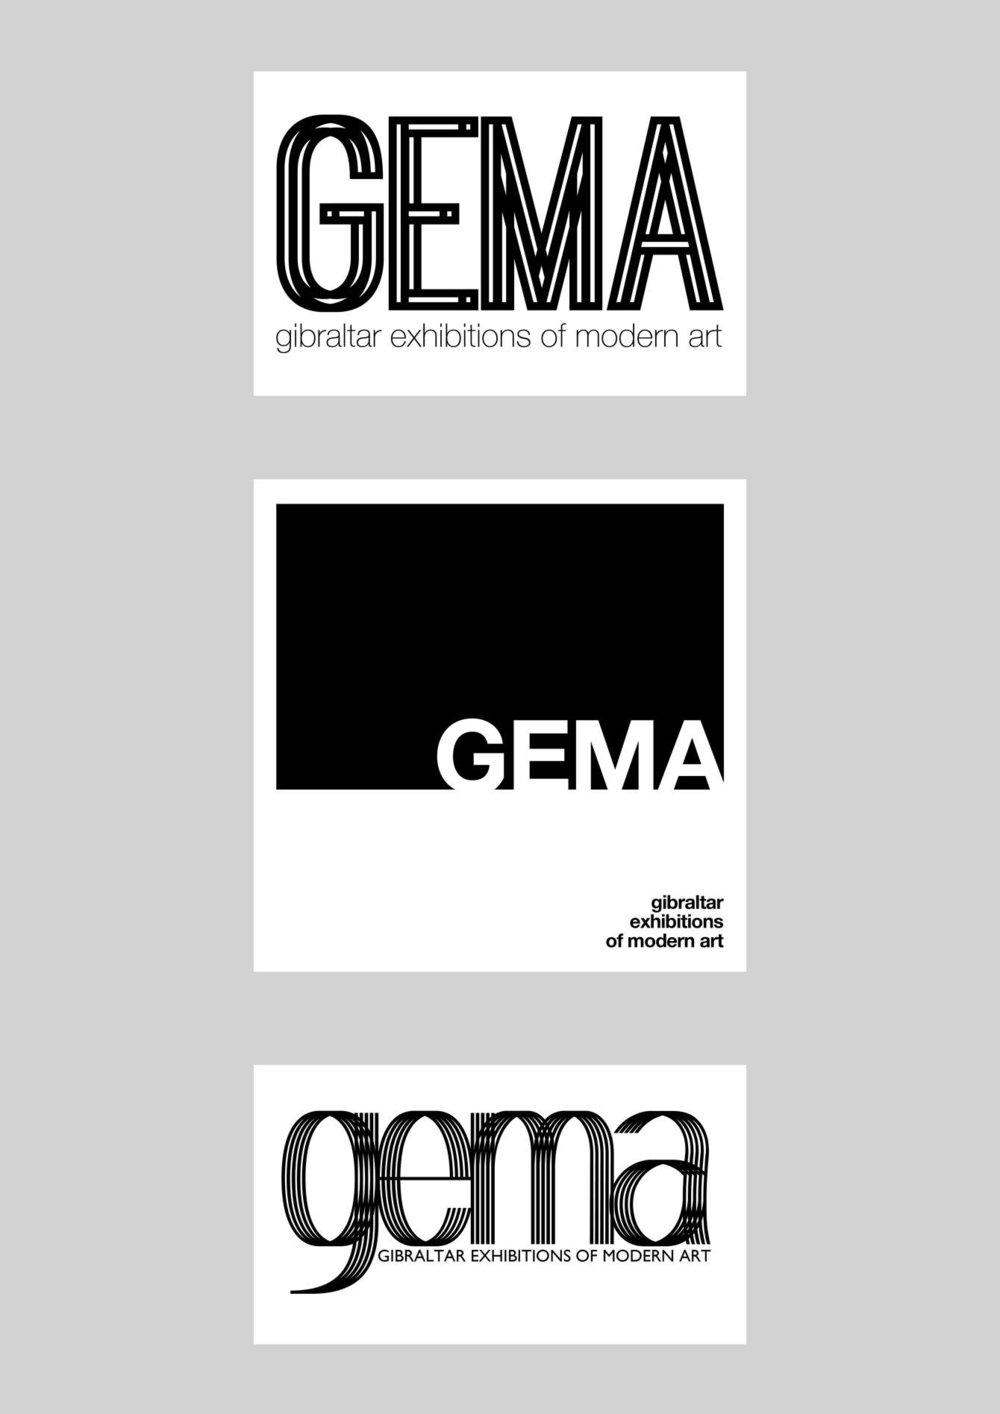 gema_1340_c.jpg